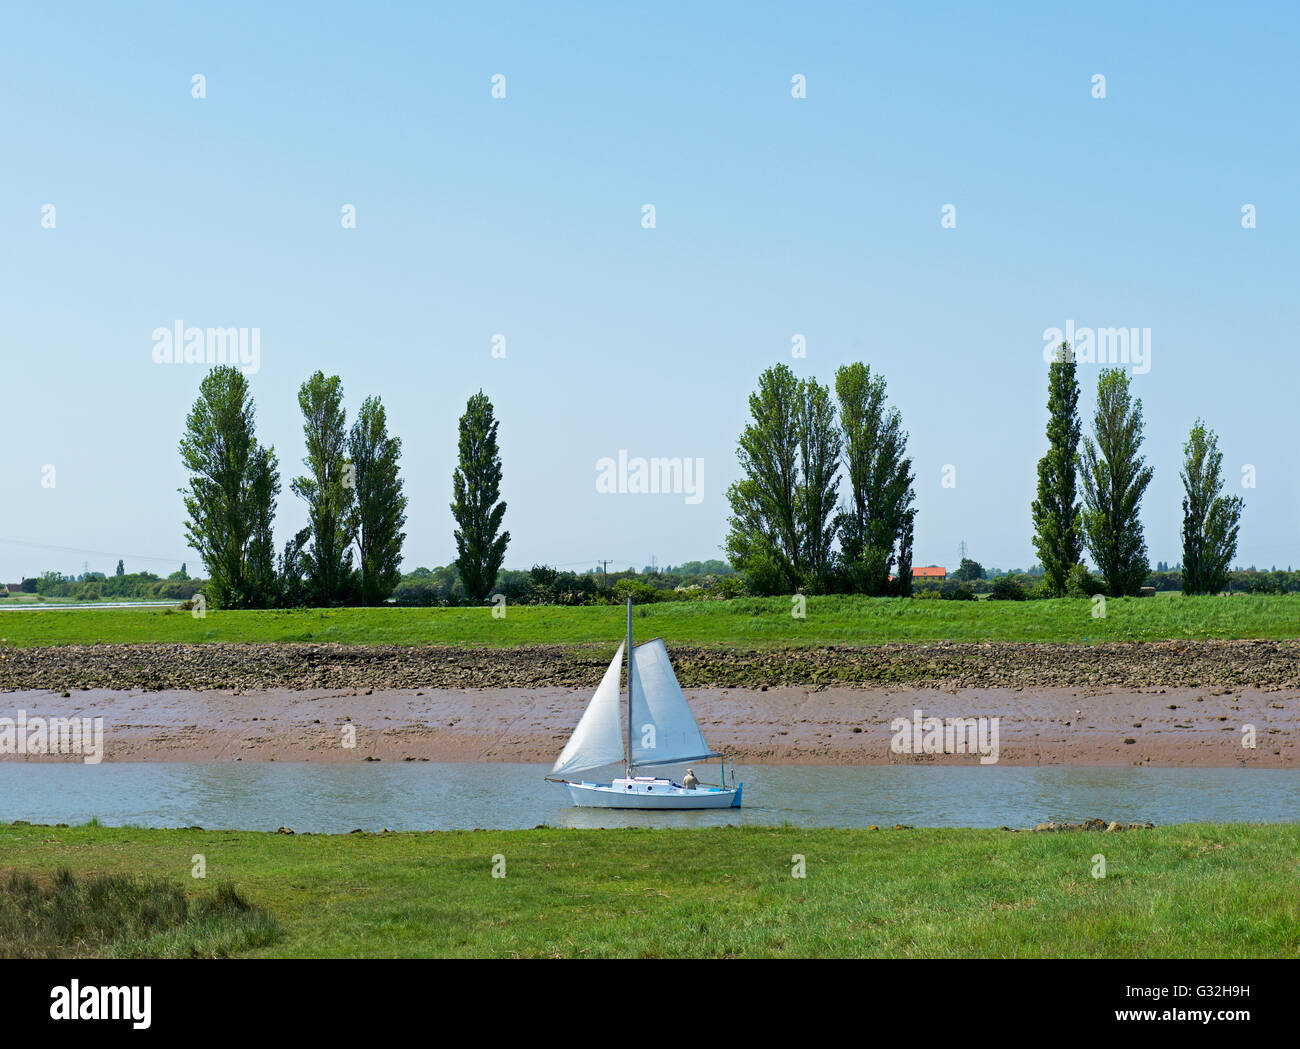 Barco de vela en el río Paraíso, cerca de Boston, Lincolnshire, Inglaterra Imagen De Stock